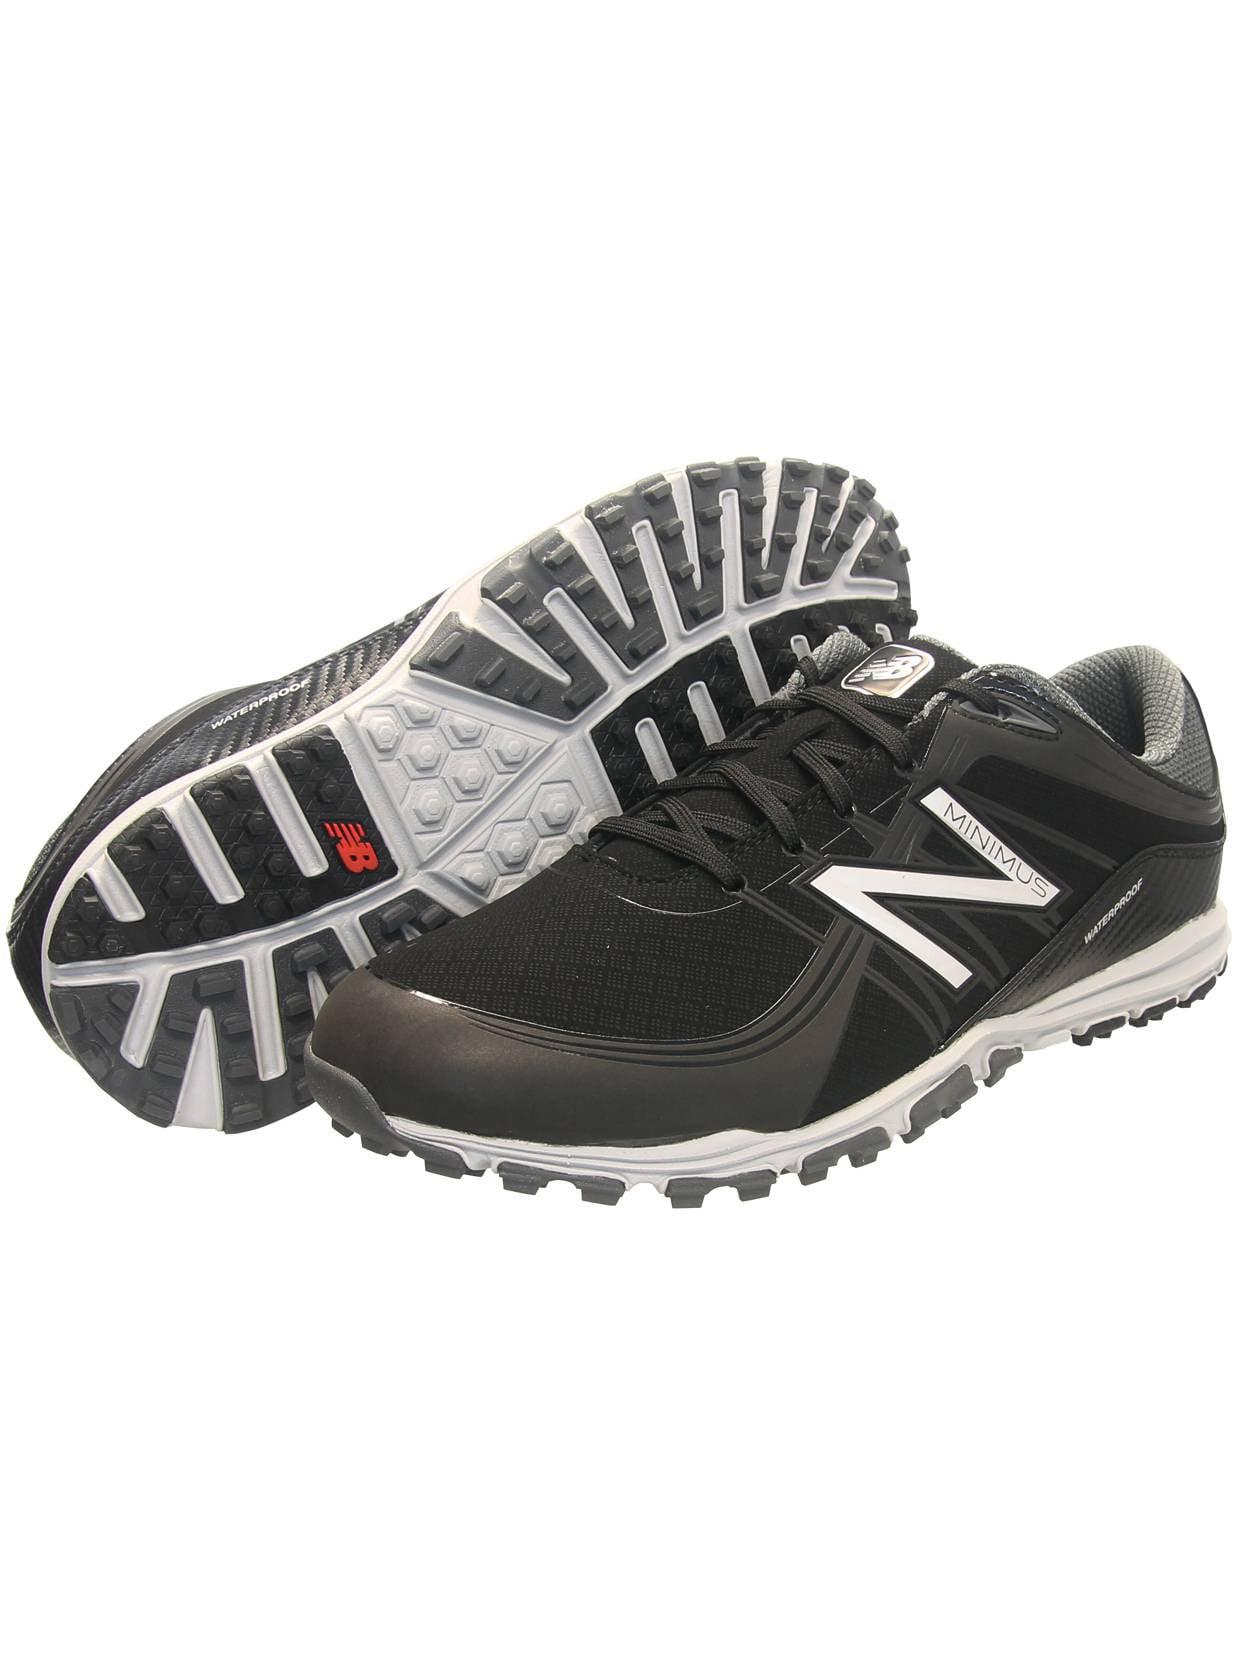 New Balance NBG1005 Men's Minimus Spikeless Golf Shoe, Brand New - by